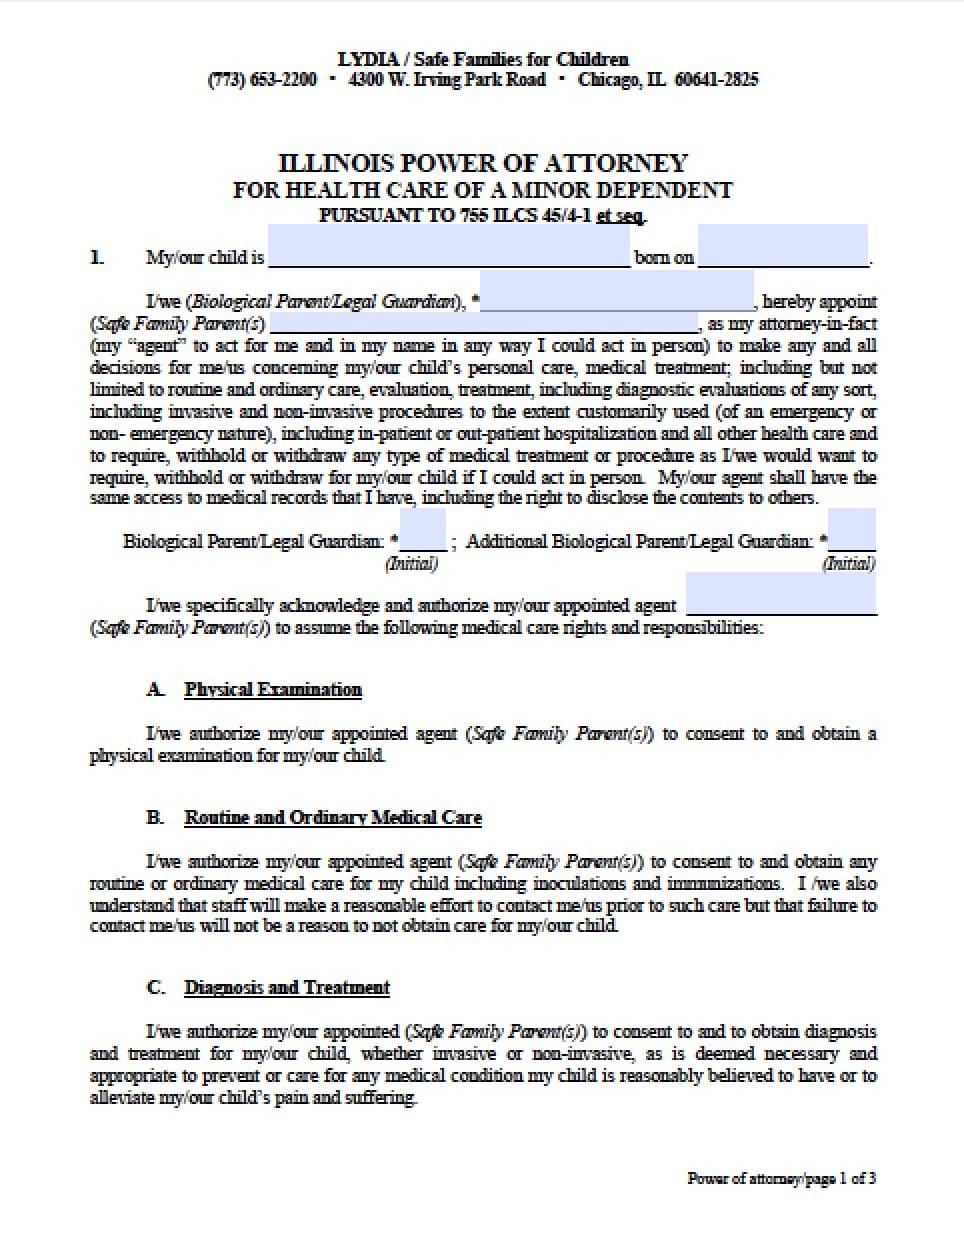 power of attorney form illinois  Illinois Minor Child Power of Attorney Form - Power of ...